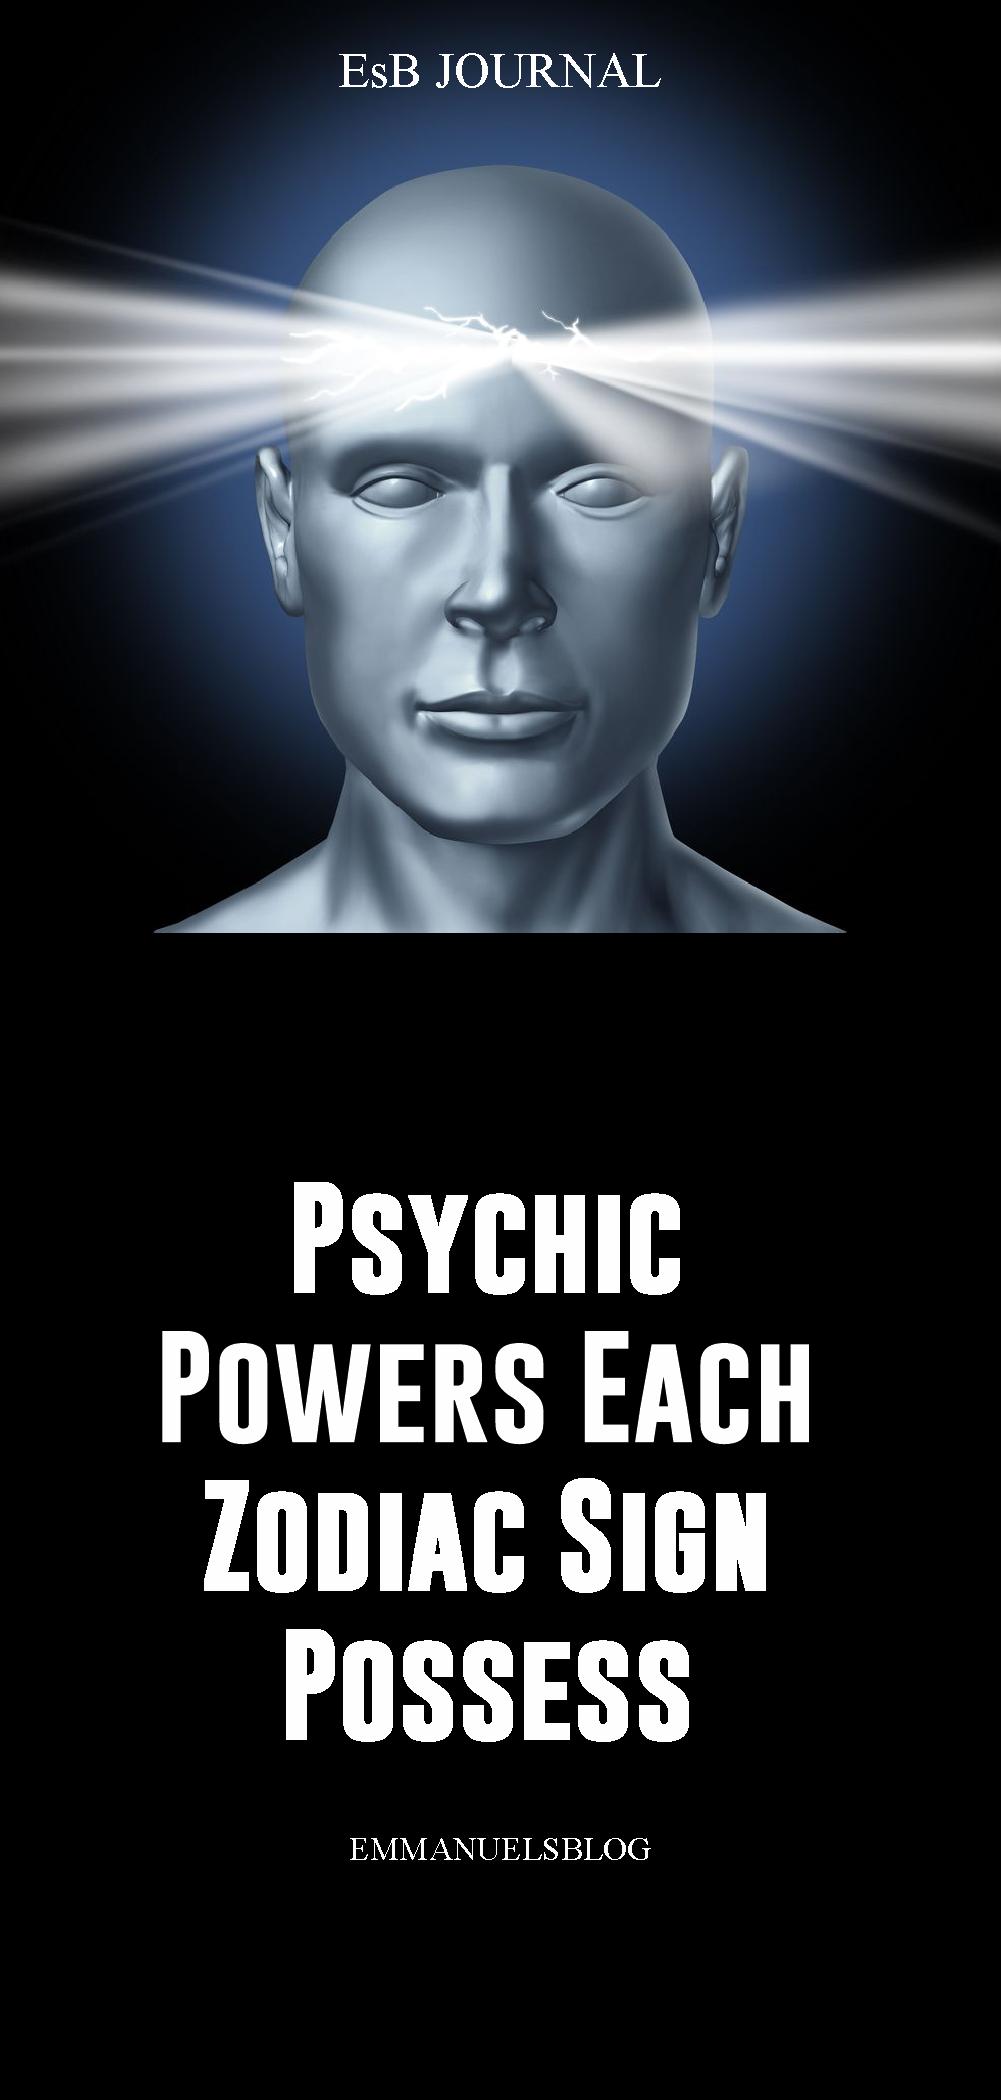 Psychic Powers Each Zodiac Sign Possess REVEALED